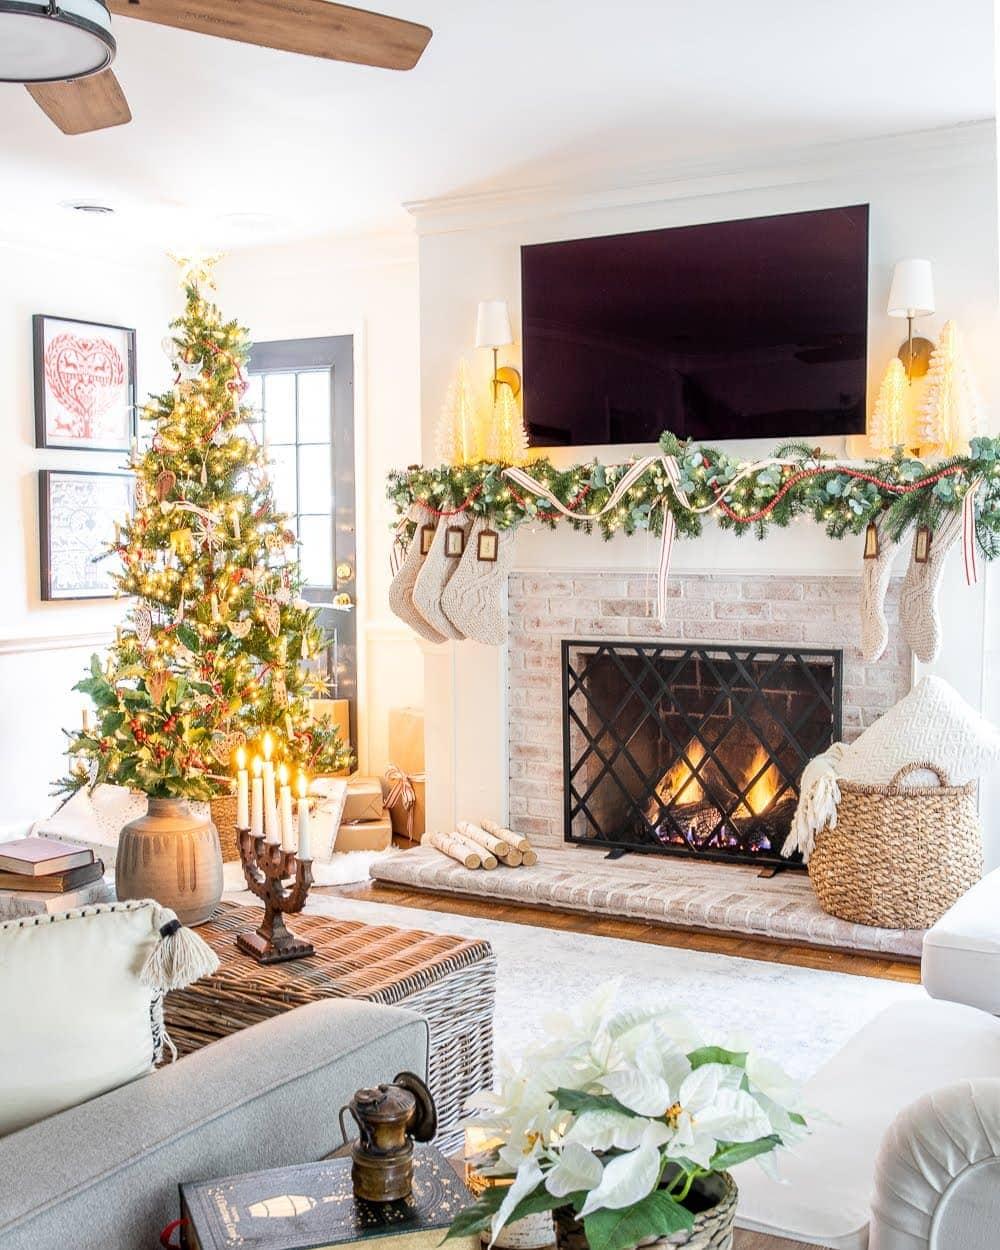 Christmas decor ideas | vintage modern living room mantel with TV and Christmas tree